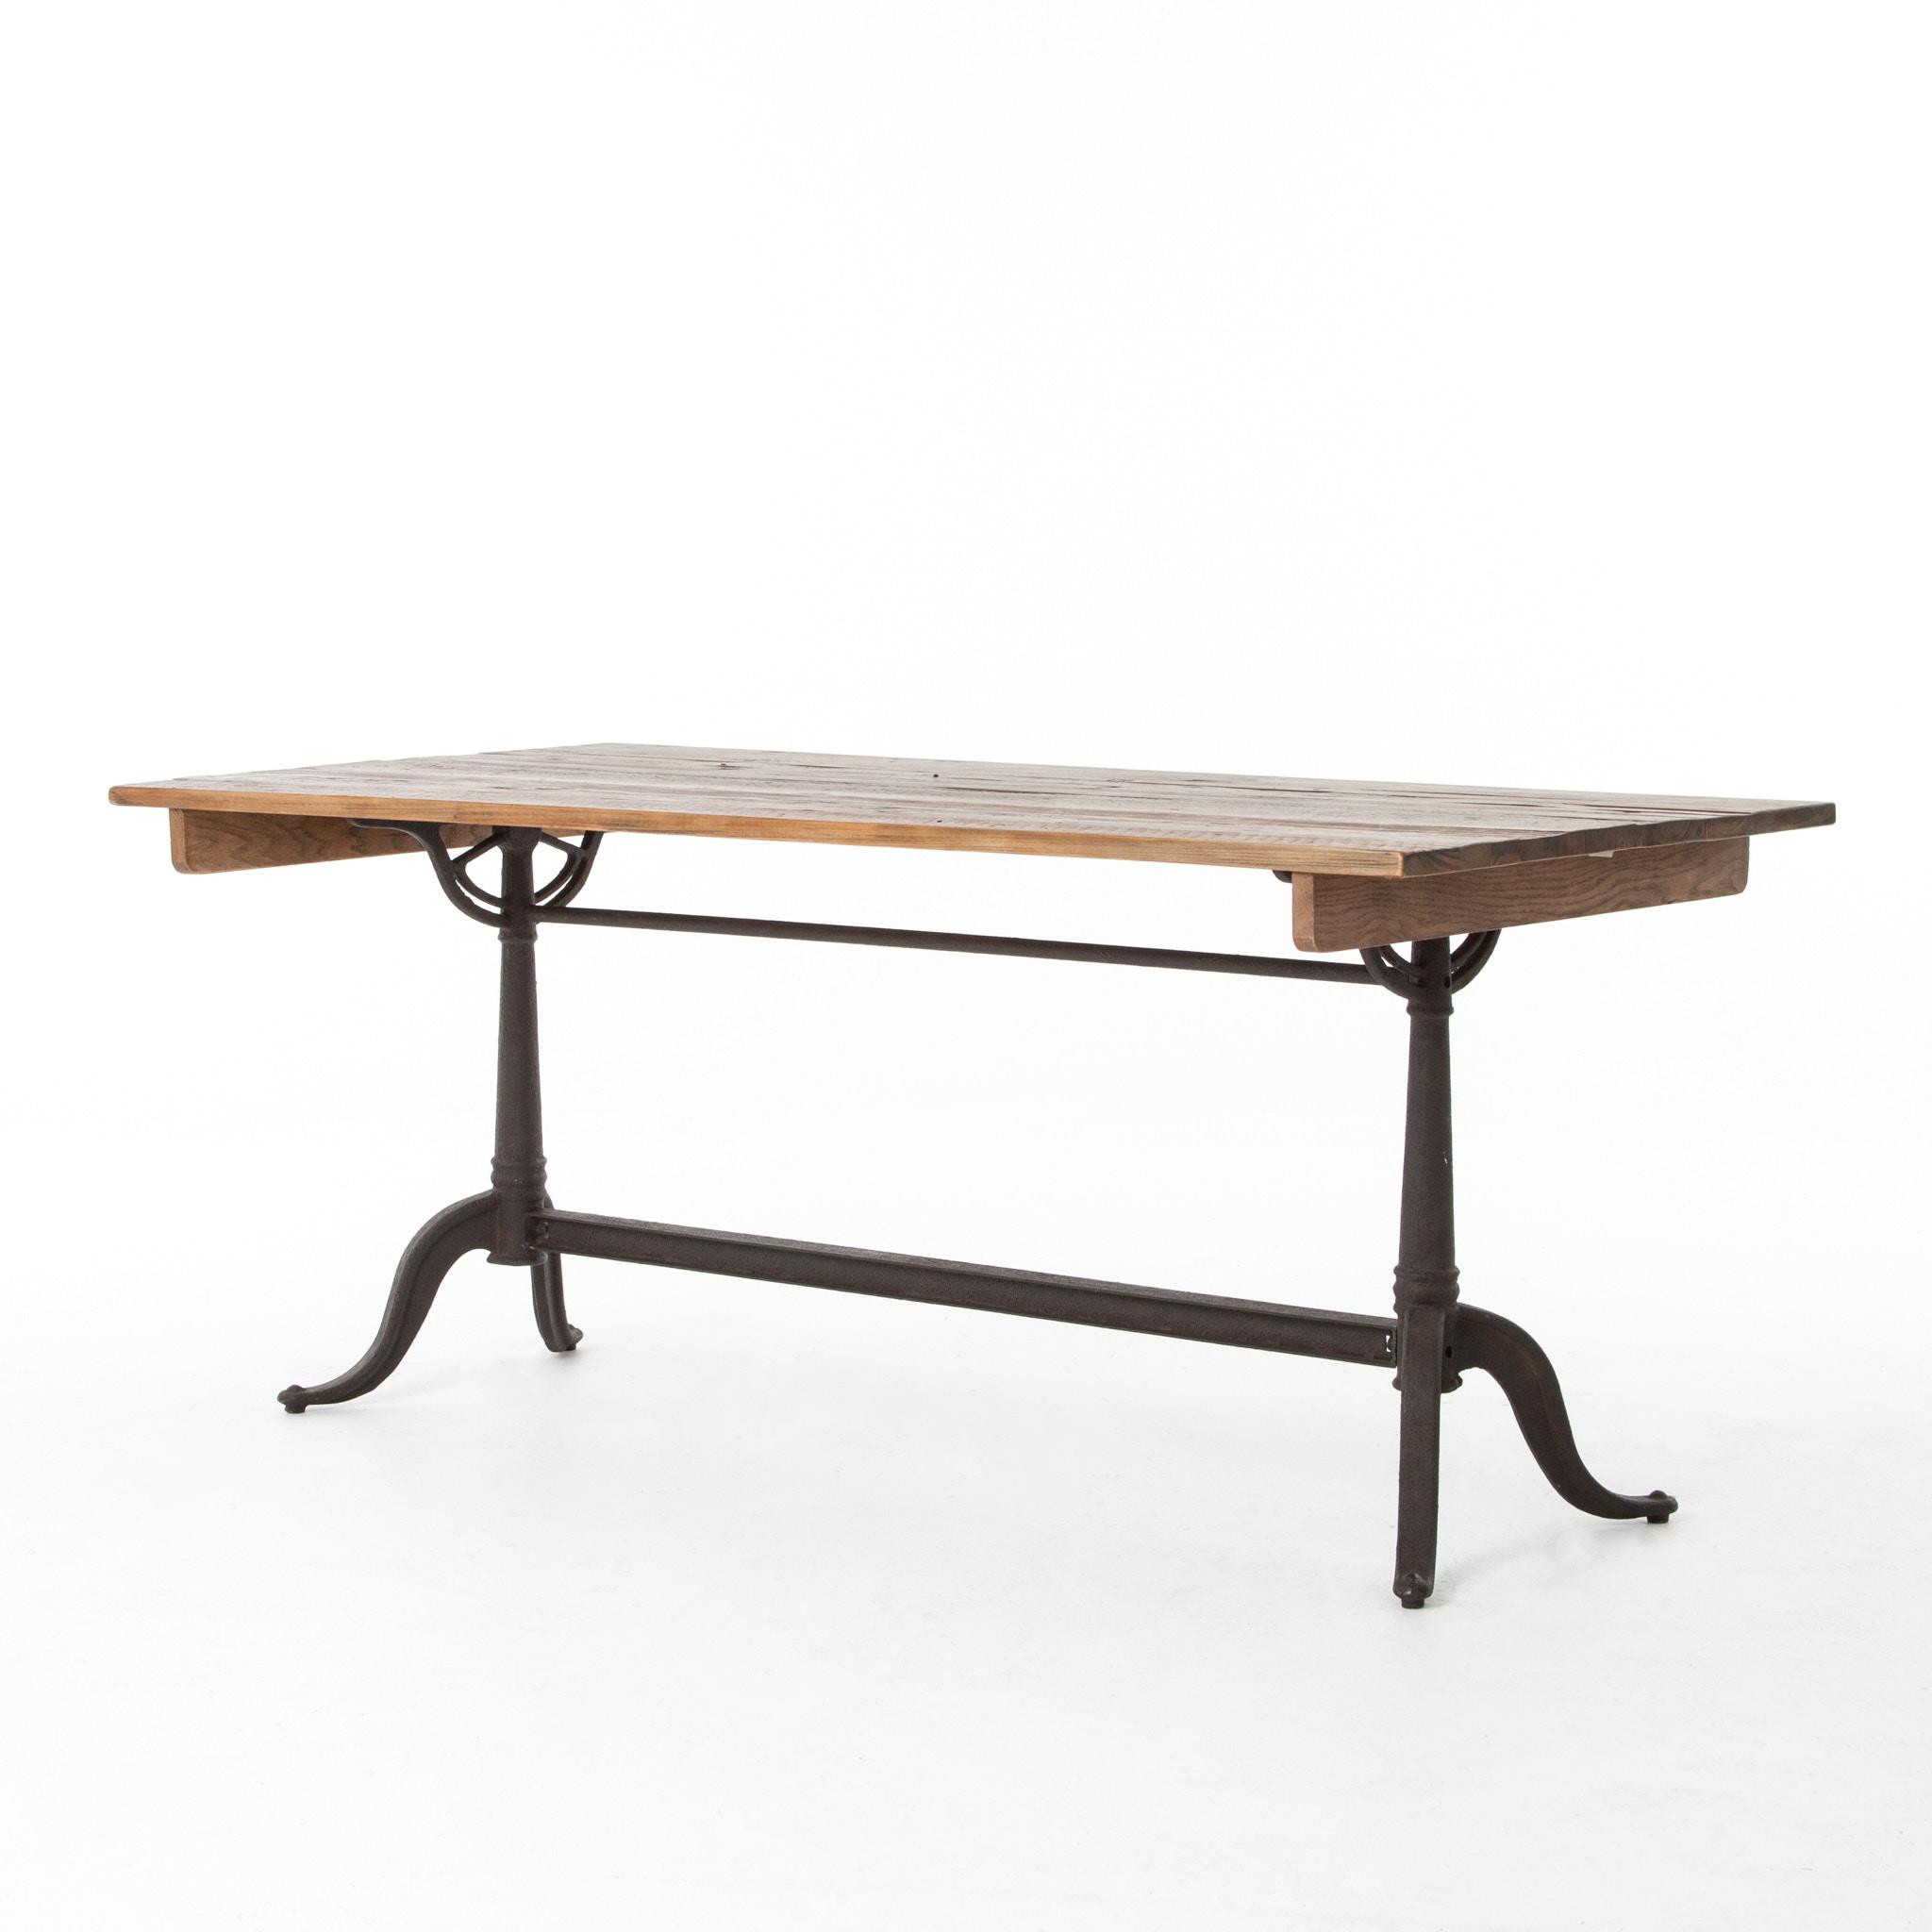 Four Hands Furniture Parisian Dining Table Bleached Pine CIMP Z5 BP